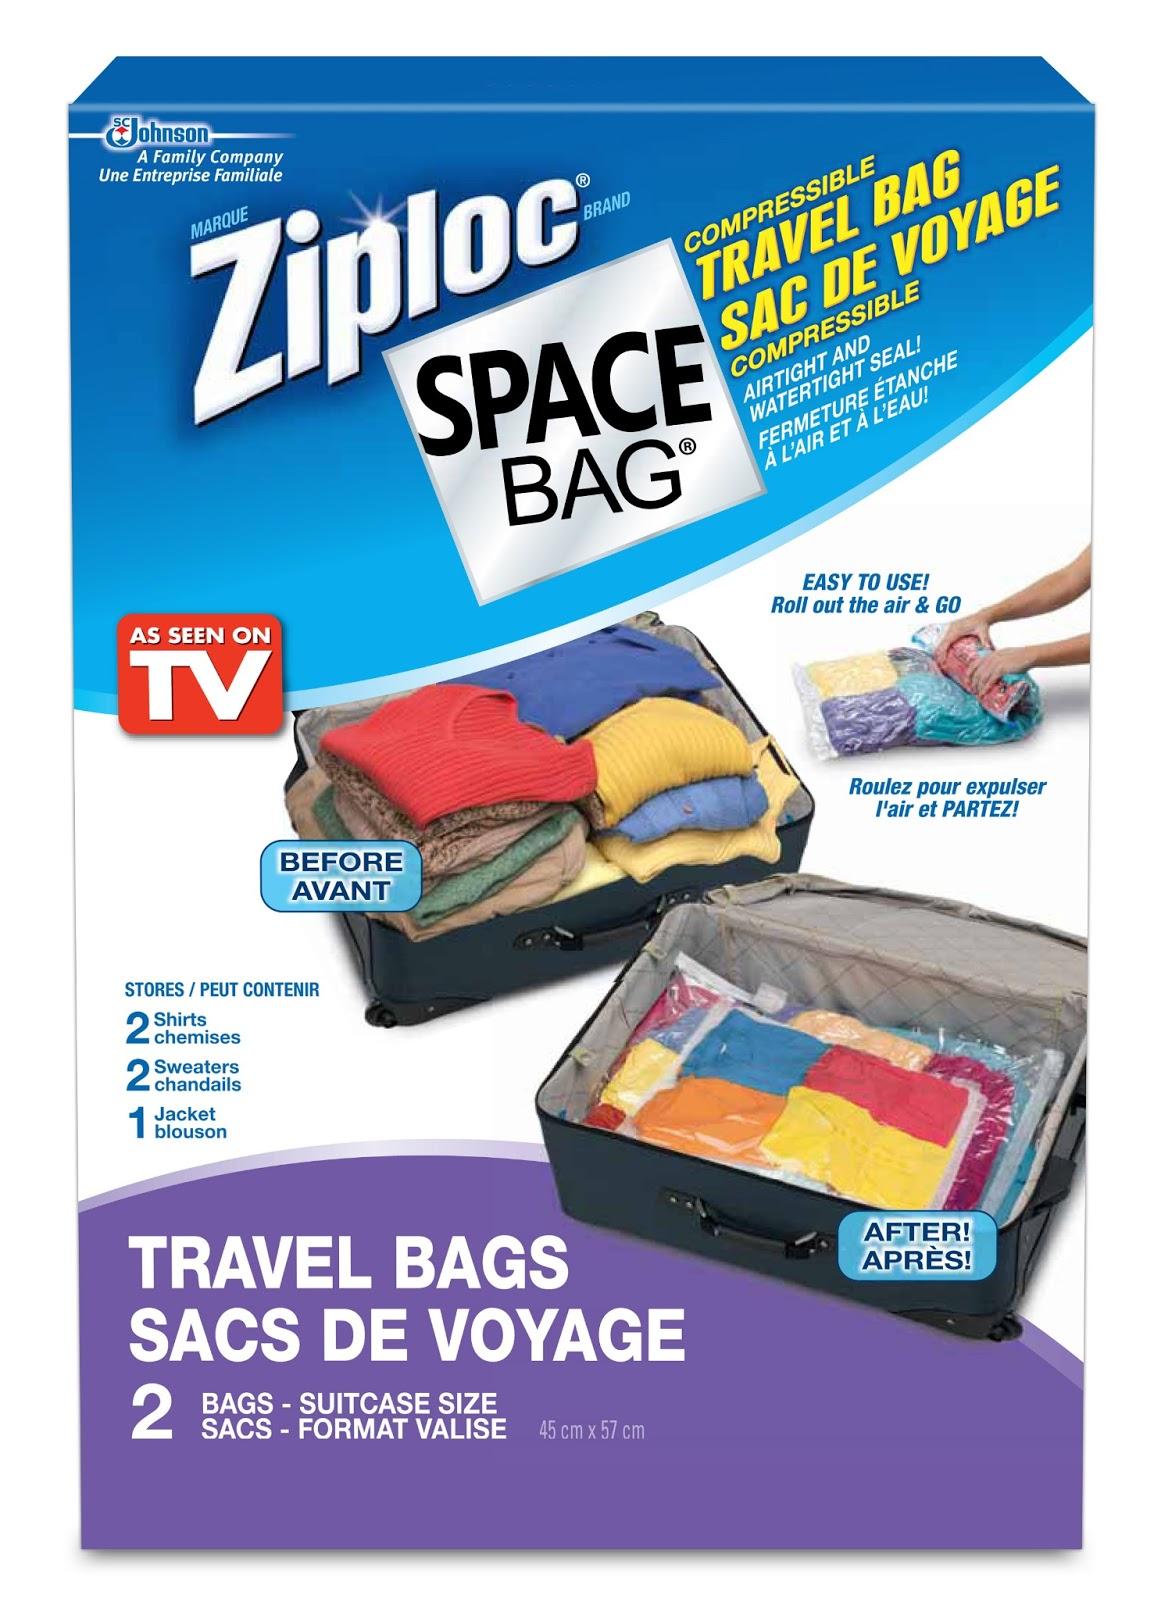 Ziploc Travel Space Bags Reviews